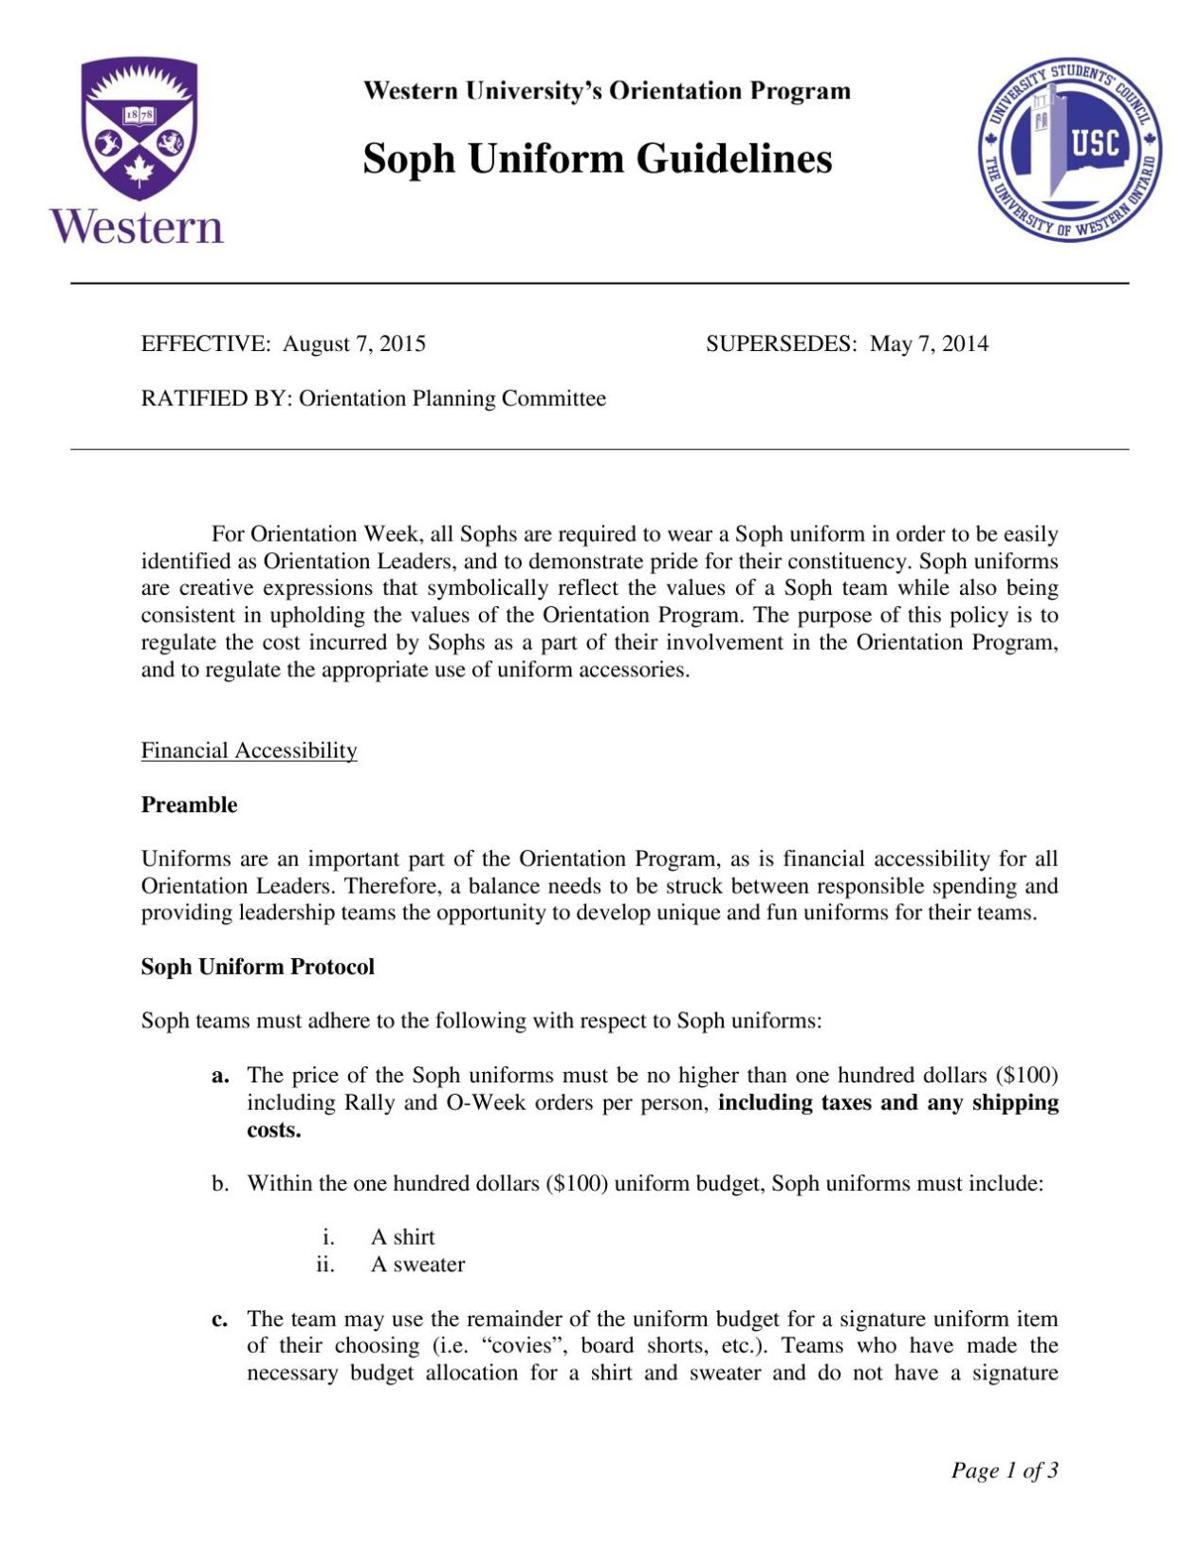 Uniform Guidelines (2015)